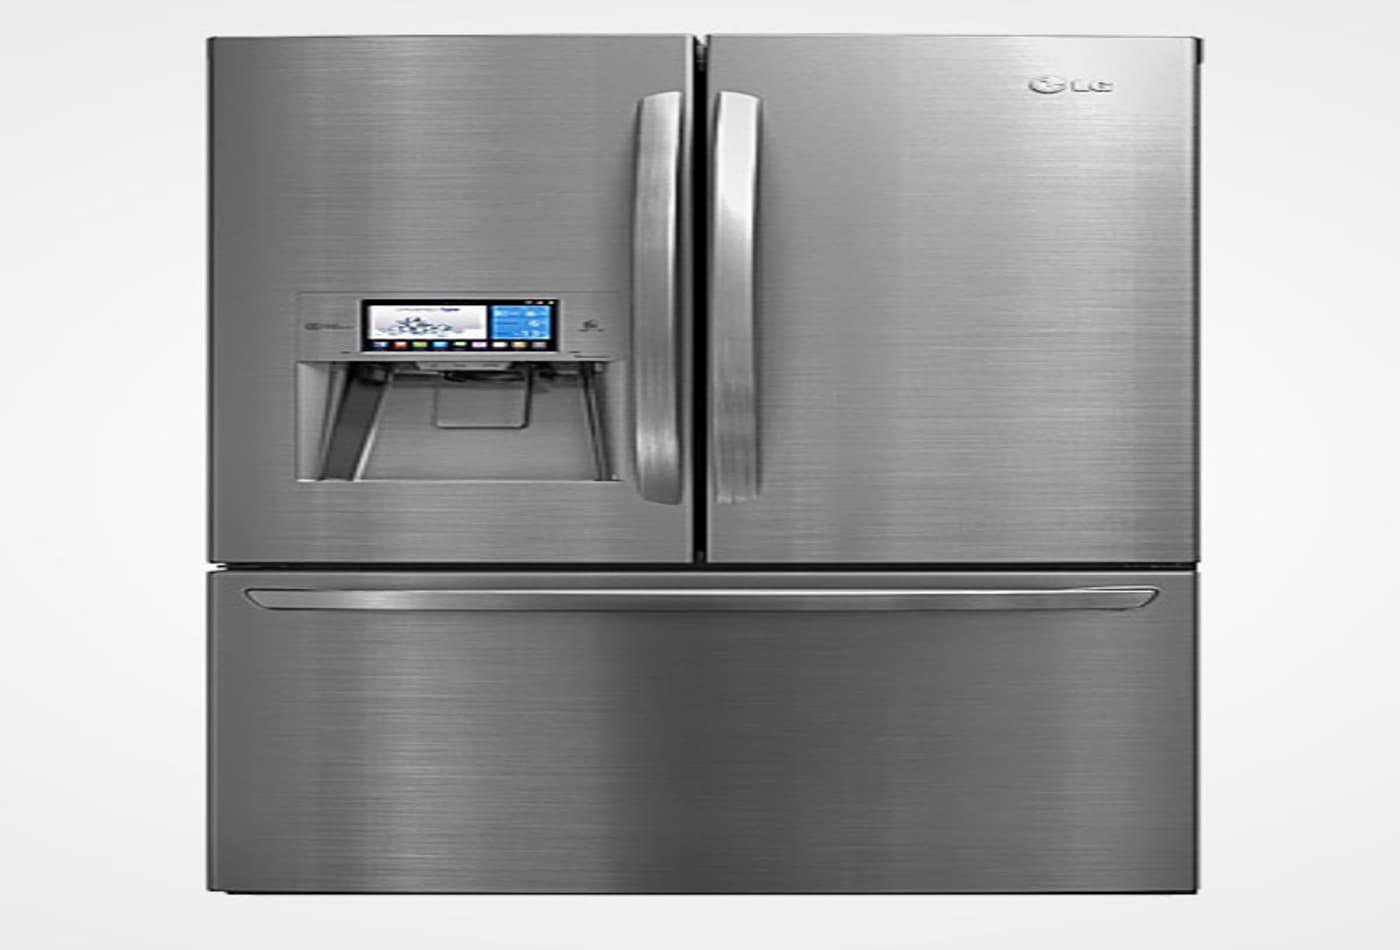 10-Smart-Dig-Appliances-LG-Refrigerator-.jpg